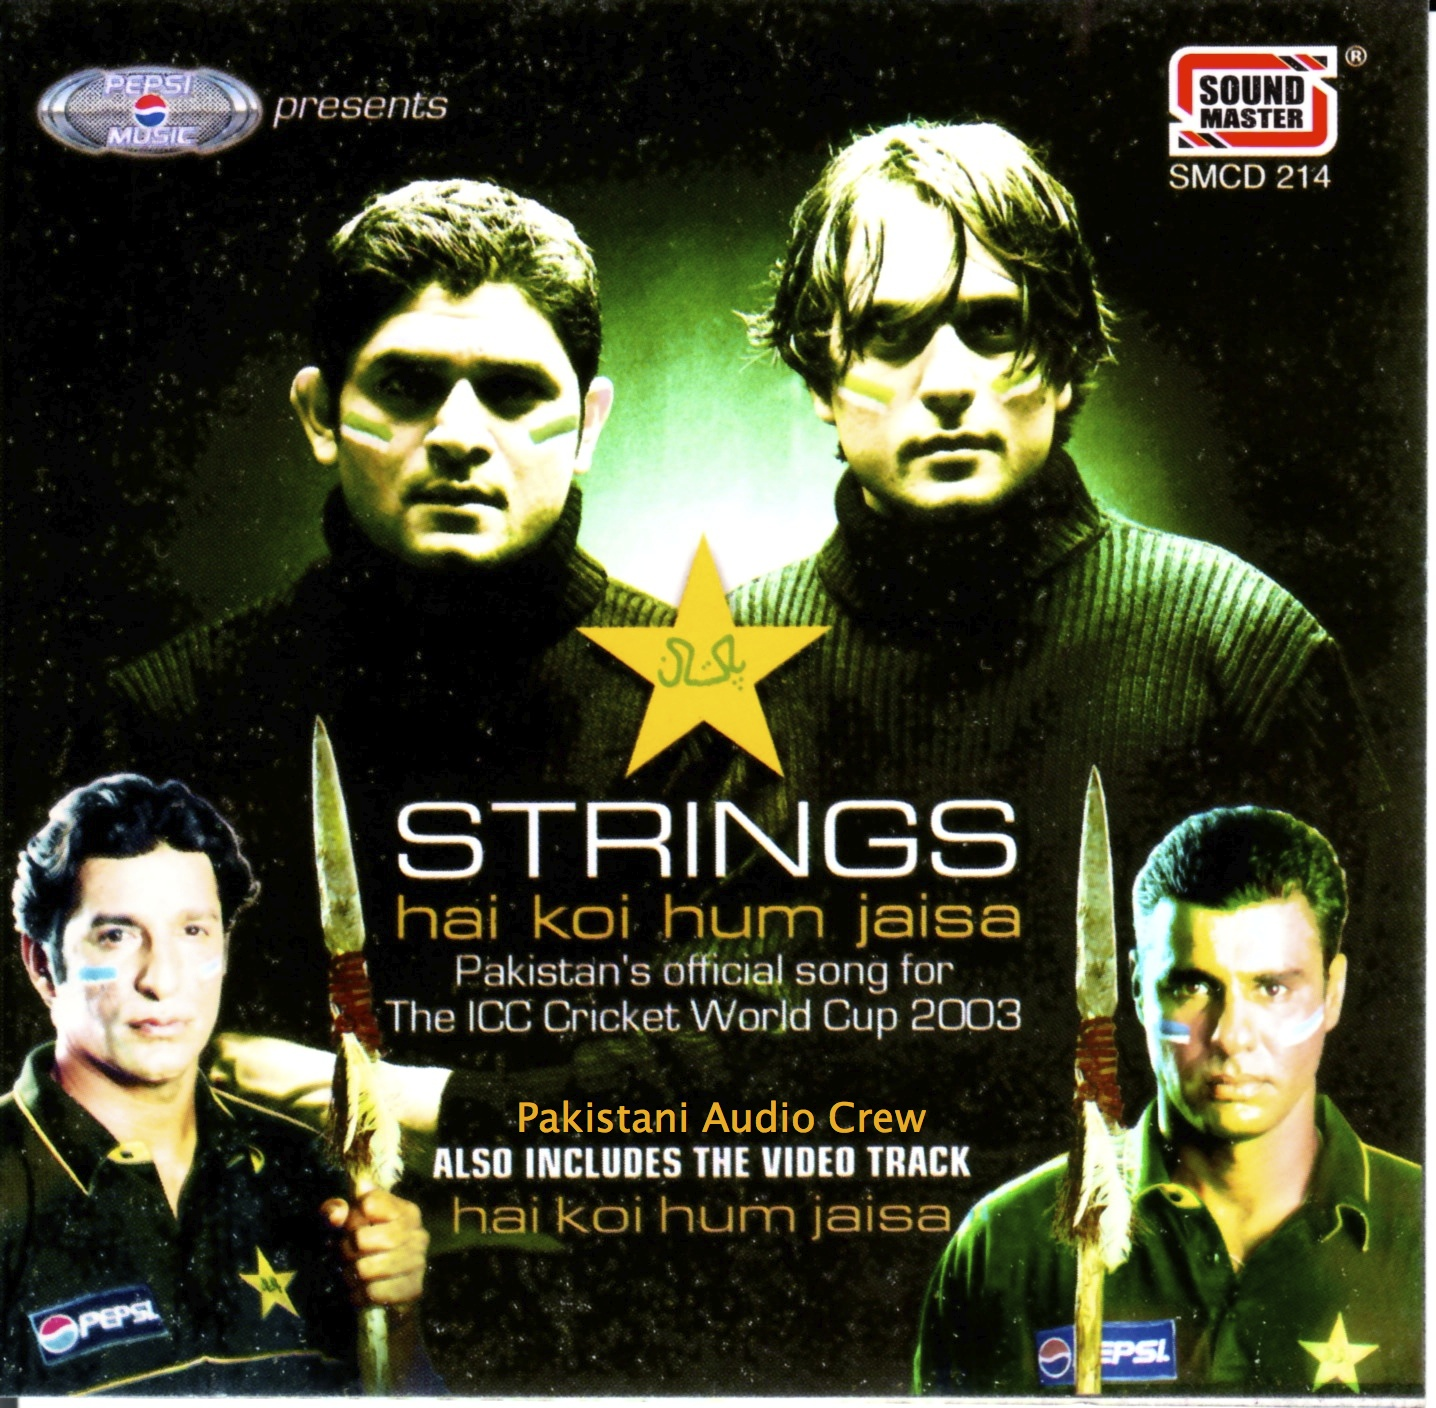 Koi Puche Mere Dil Se Mp3 Songs: Muzikeye: Strings [1990 To 2008-MP3-VBR-320Kbps]